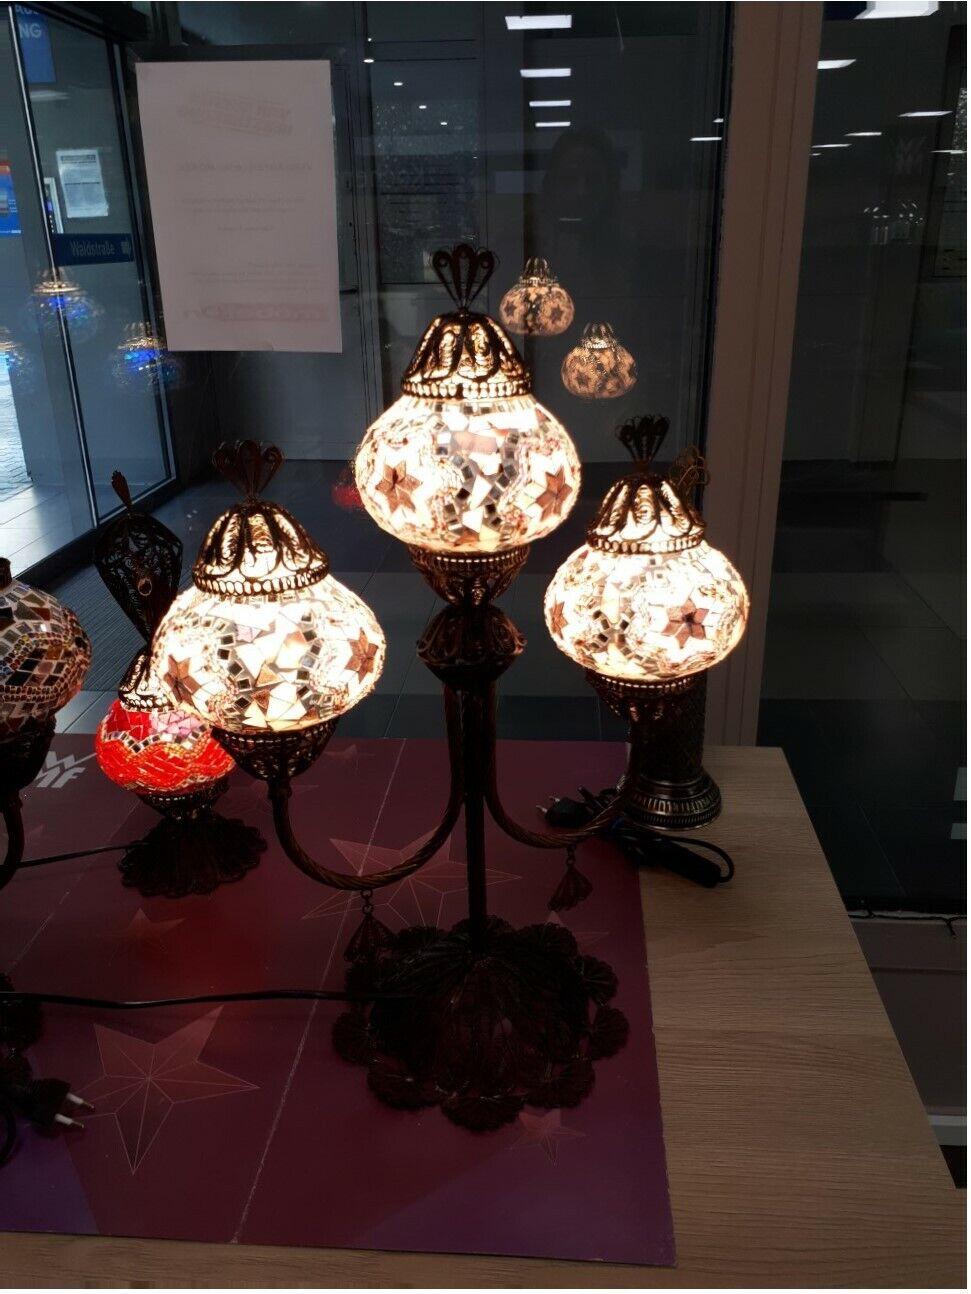 Mosaik Stehlampe Tischlampe Standlampe Orientalische Unikat 3 kugel Lampe